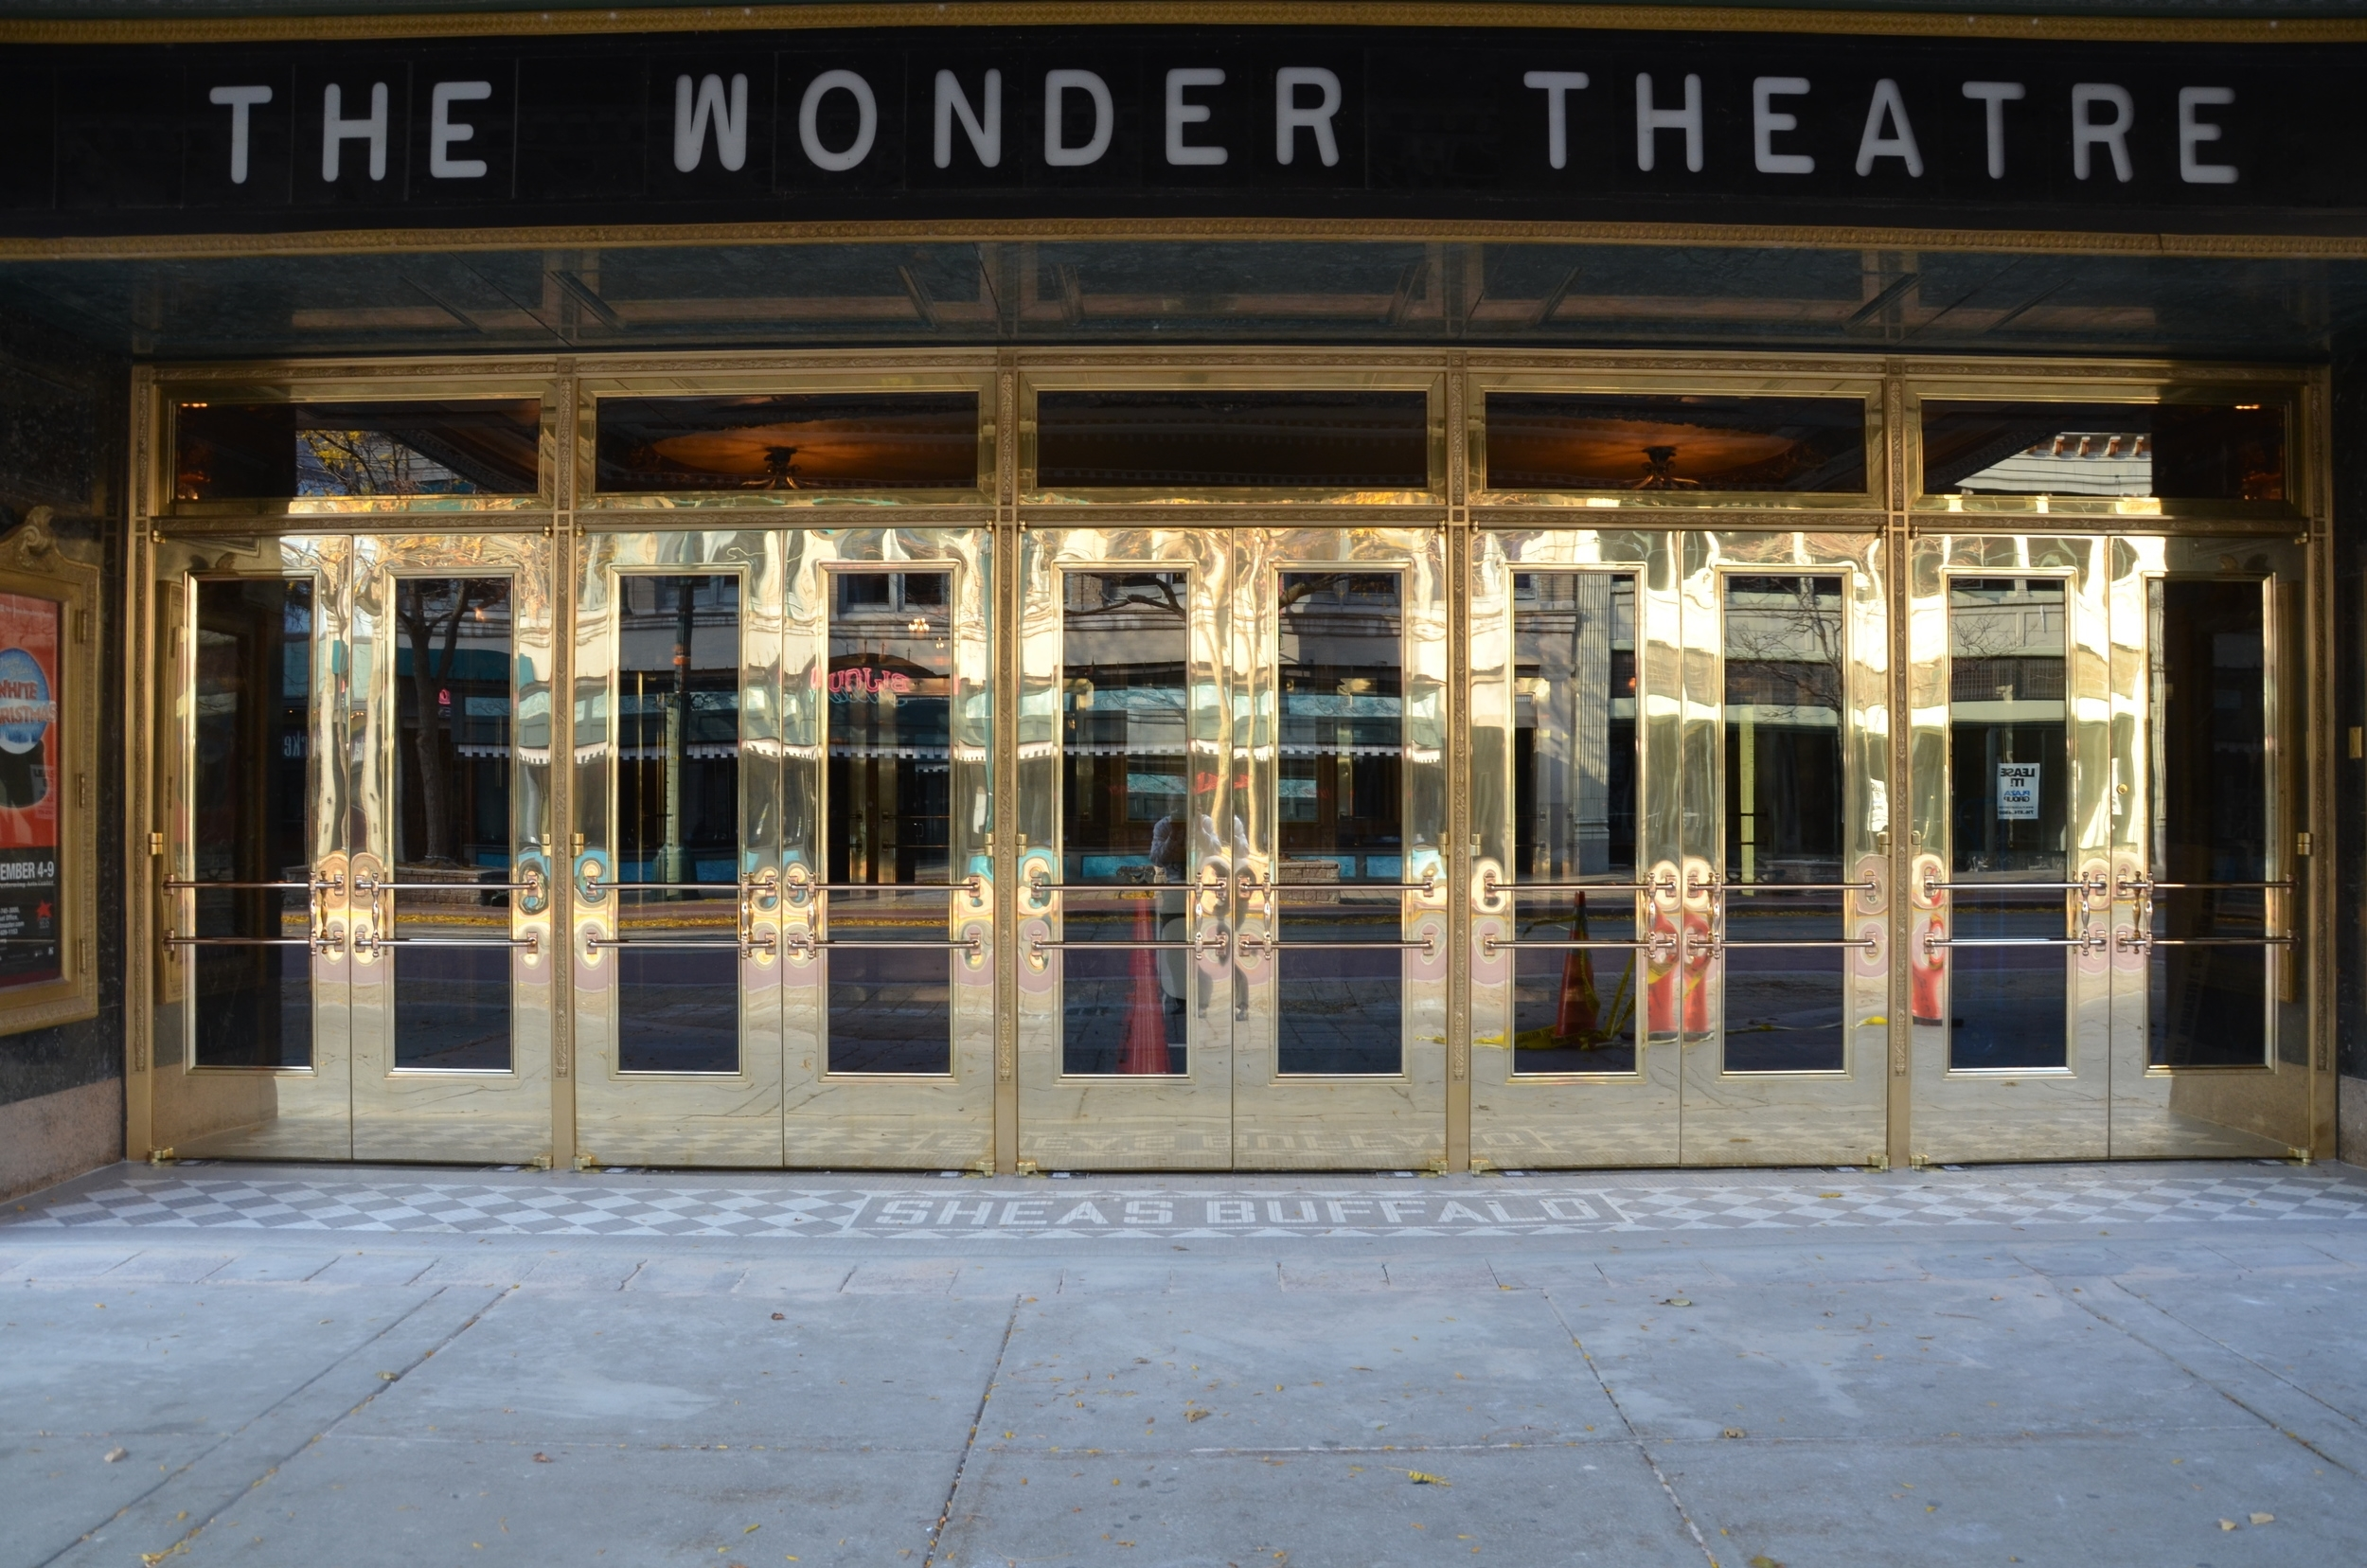 Shea's Buffalo Theater - Exterior Door Replacement Project (Historical Restoration), Custom Brass Doors